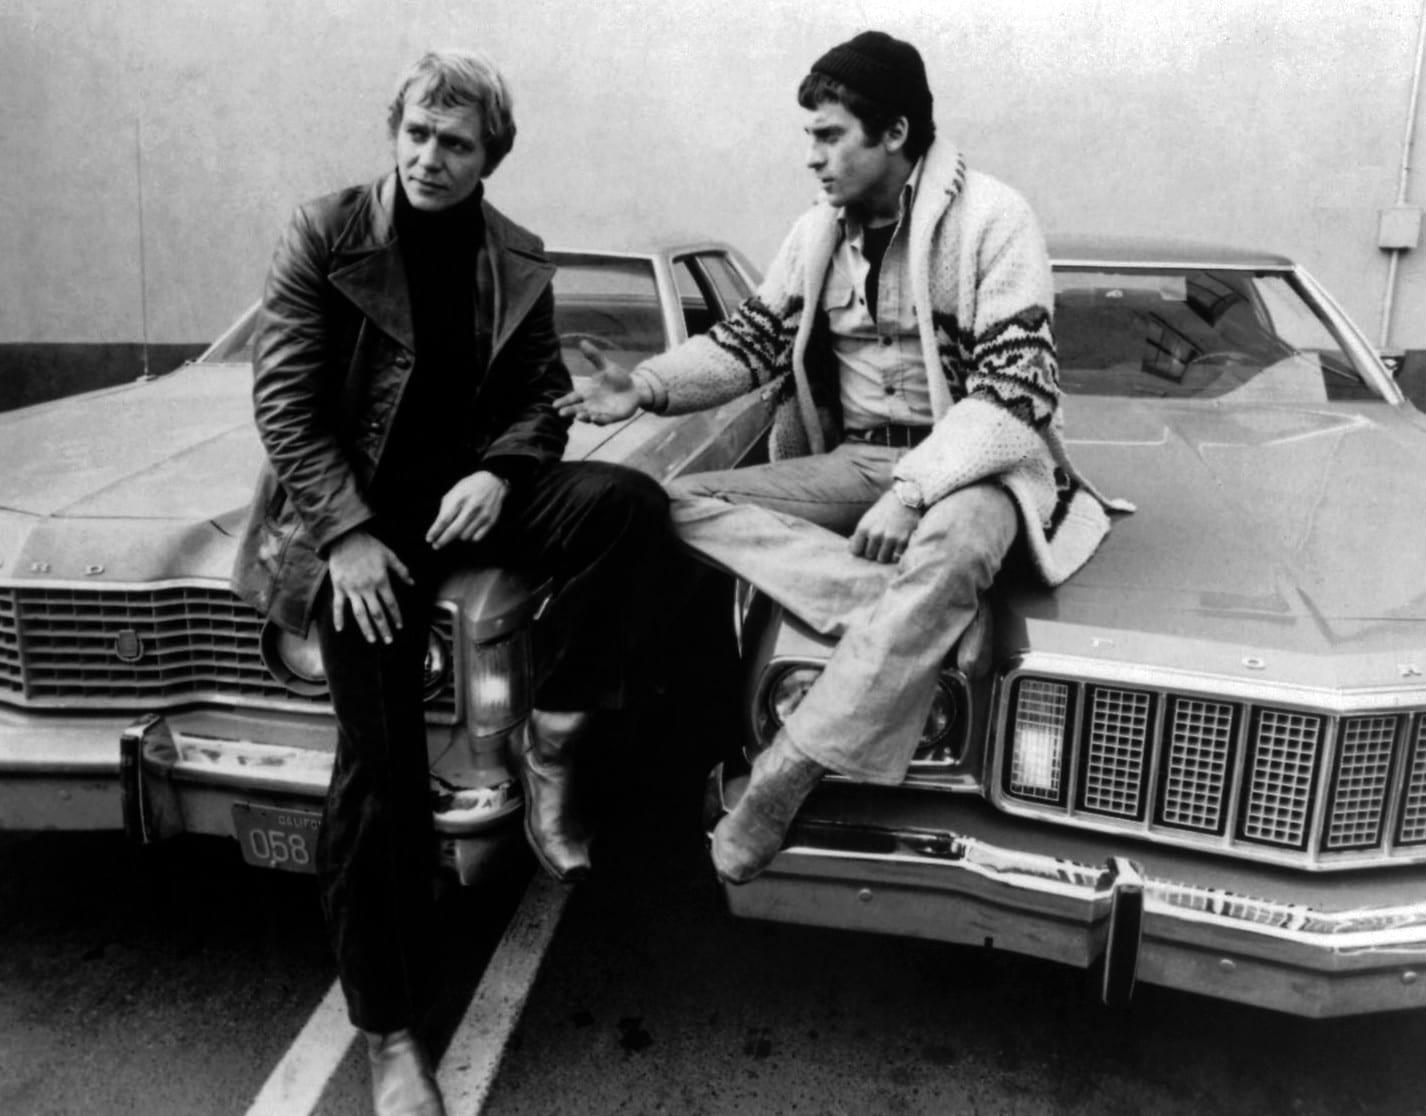 David_Soul_Paul_Michael_Glaser_Starsky_and_Hutch_1975